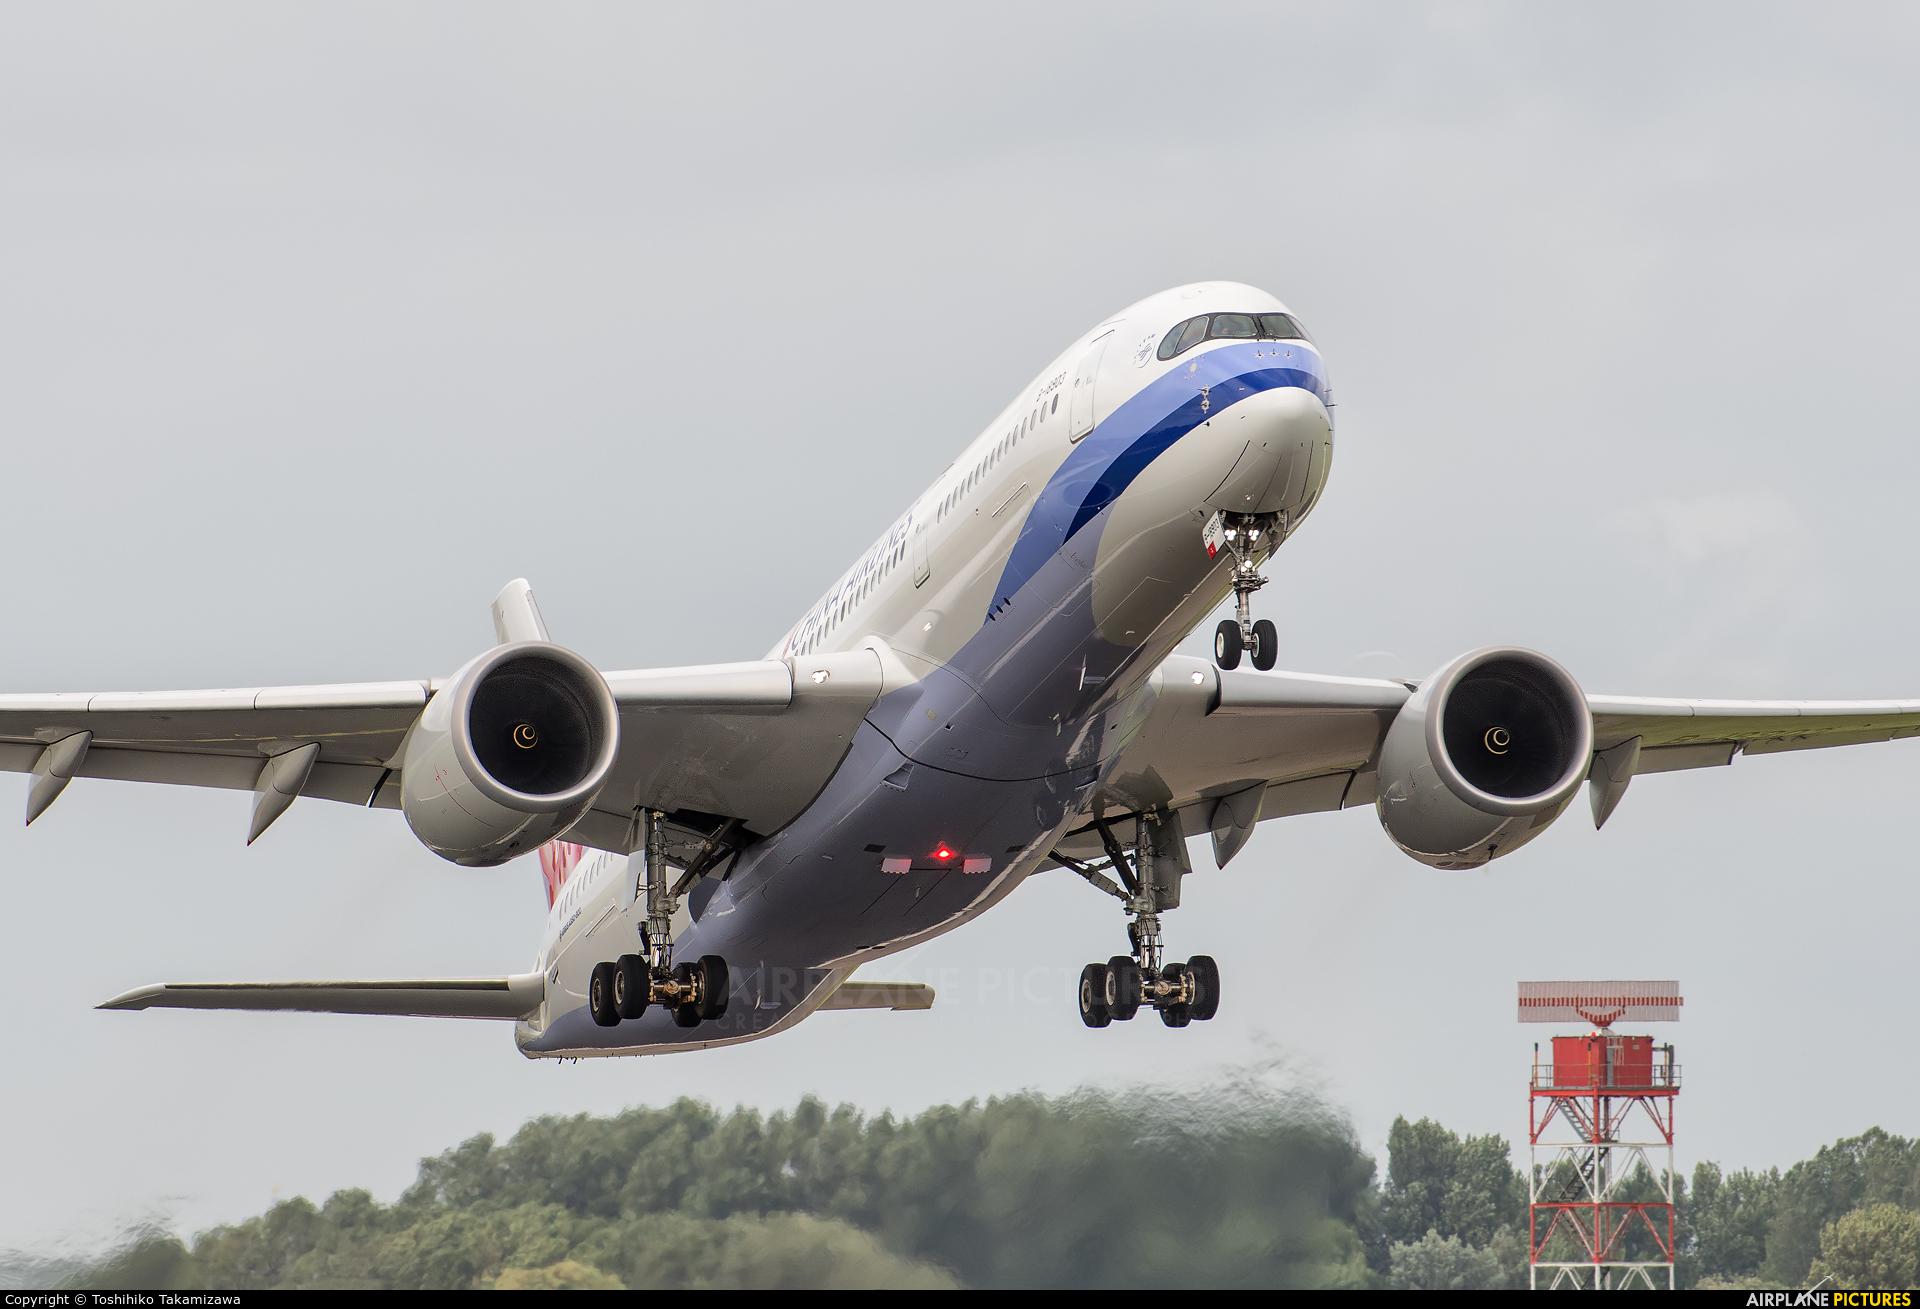 China Airlines B-18903 aircraft at Amsterdam - Schiphol